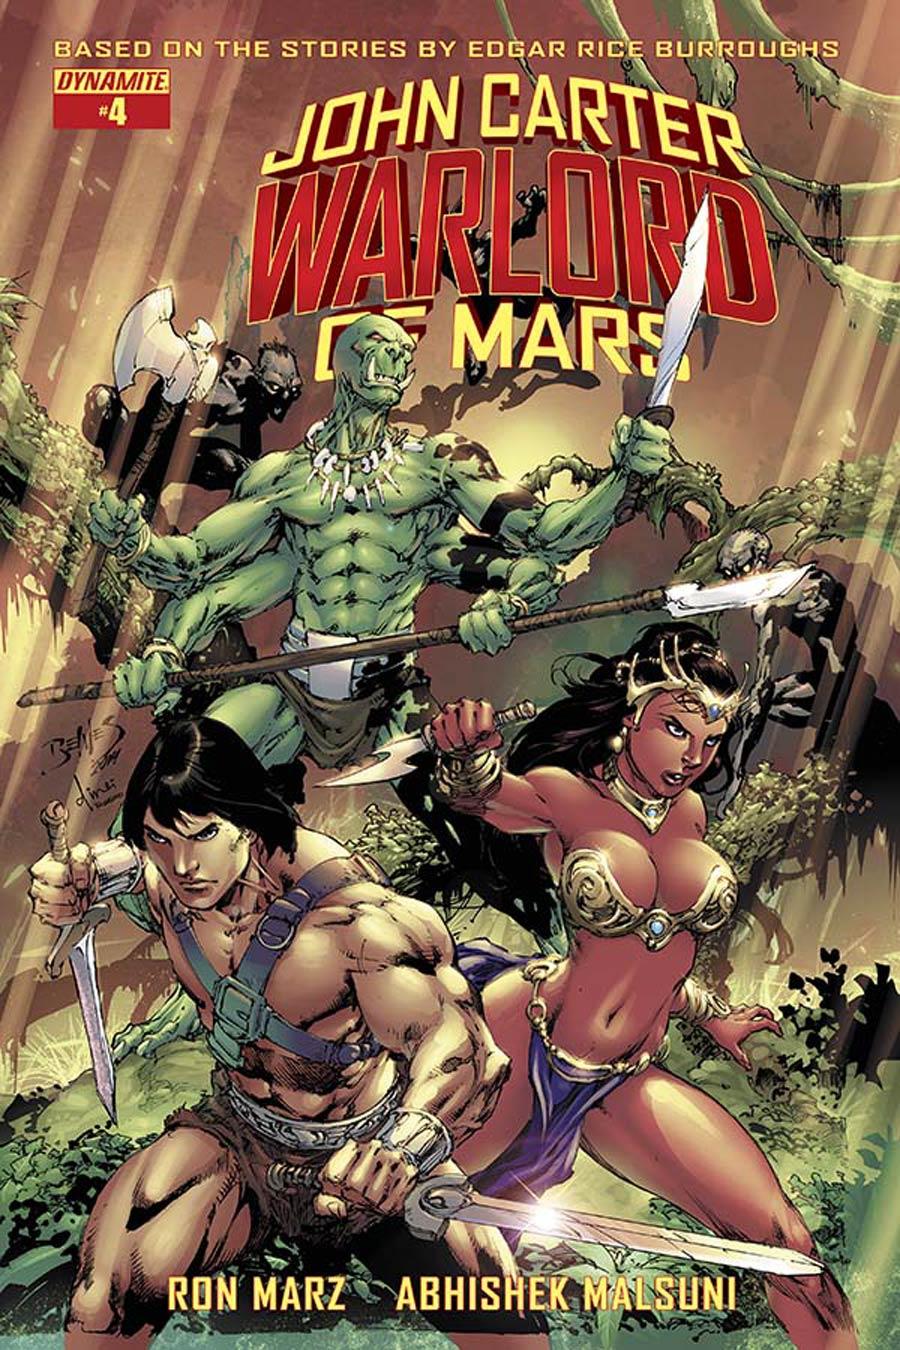 John Carter Warlord Of Mars Vol 2 #4 Cover A Regular Ed Benes Cover